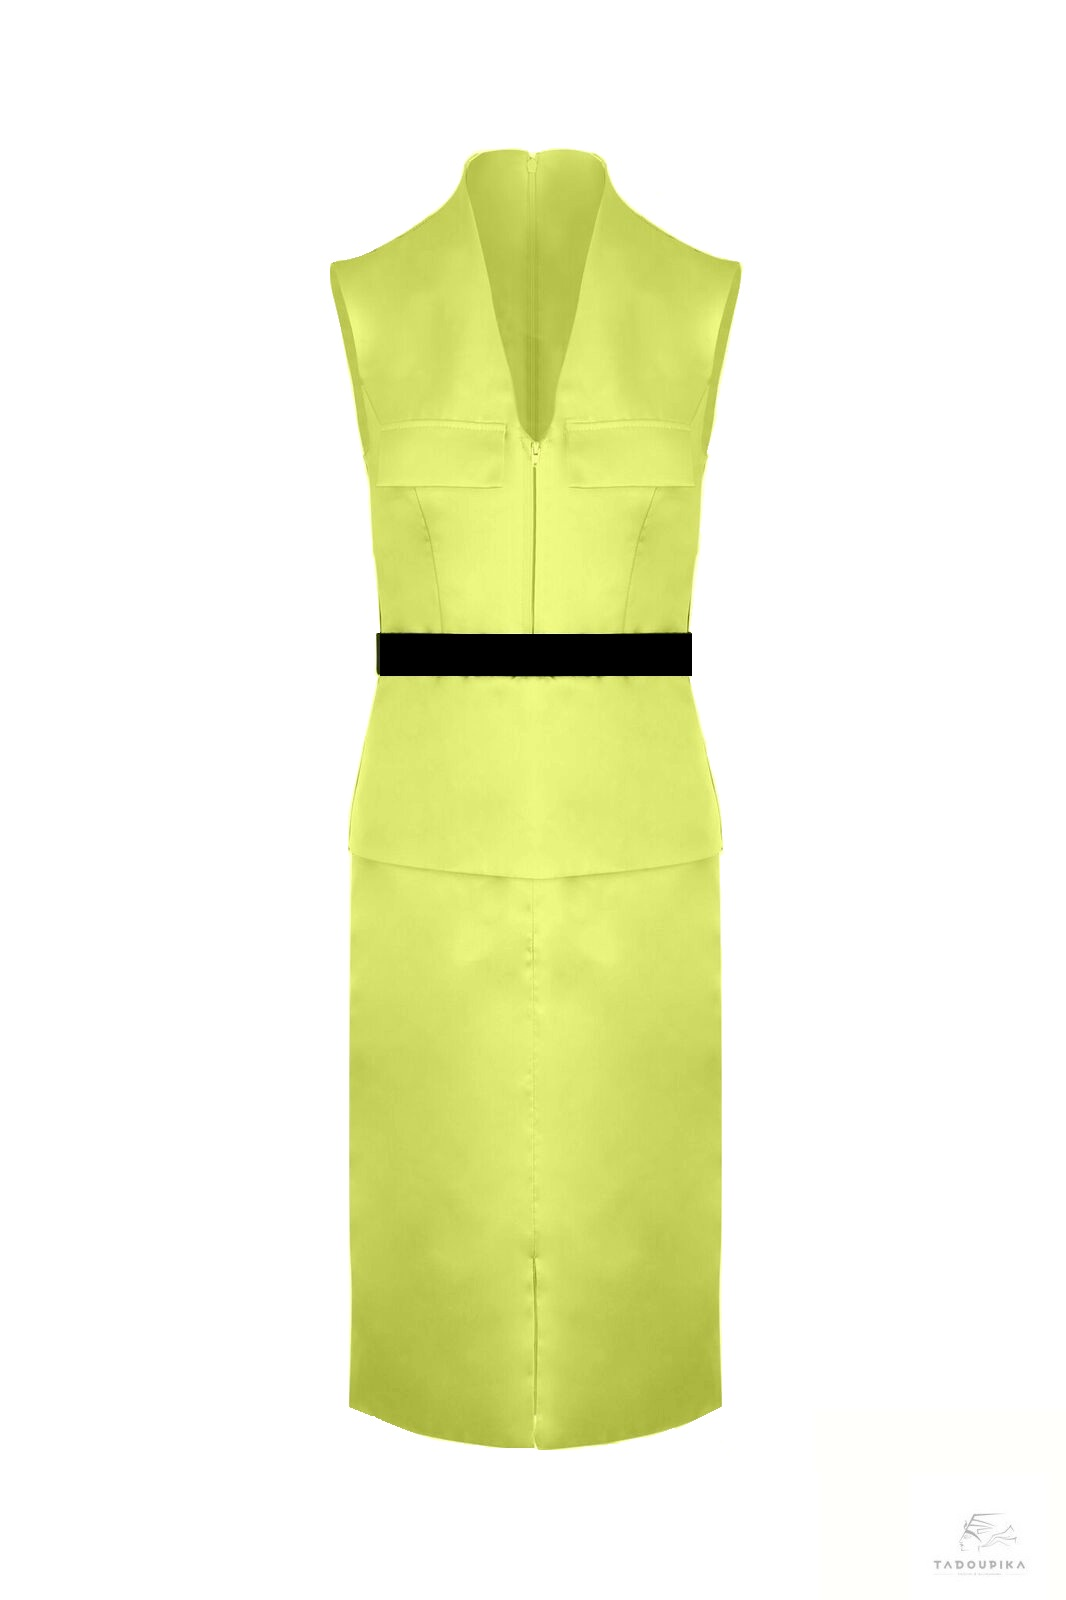 robe workin girl belt dress lenght to knee satin dress office dress made in france curves sur mesure yellow dress contrast dress illusion dress tadoupika